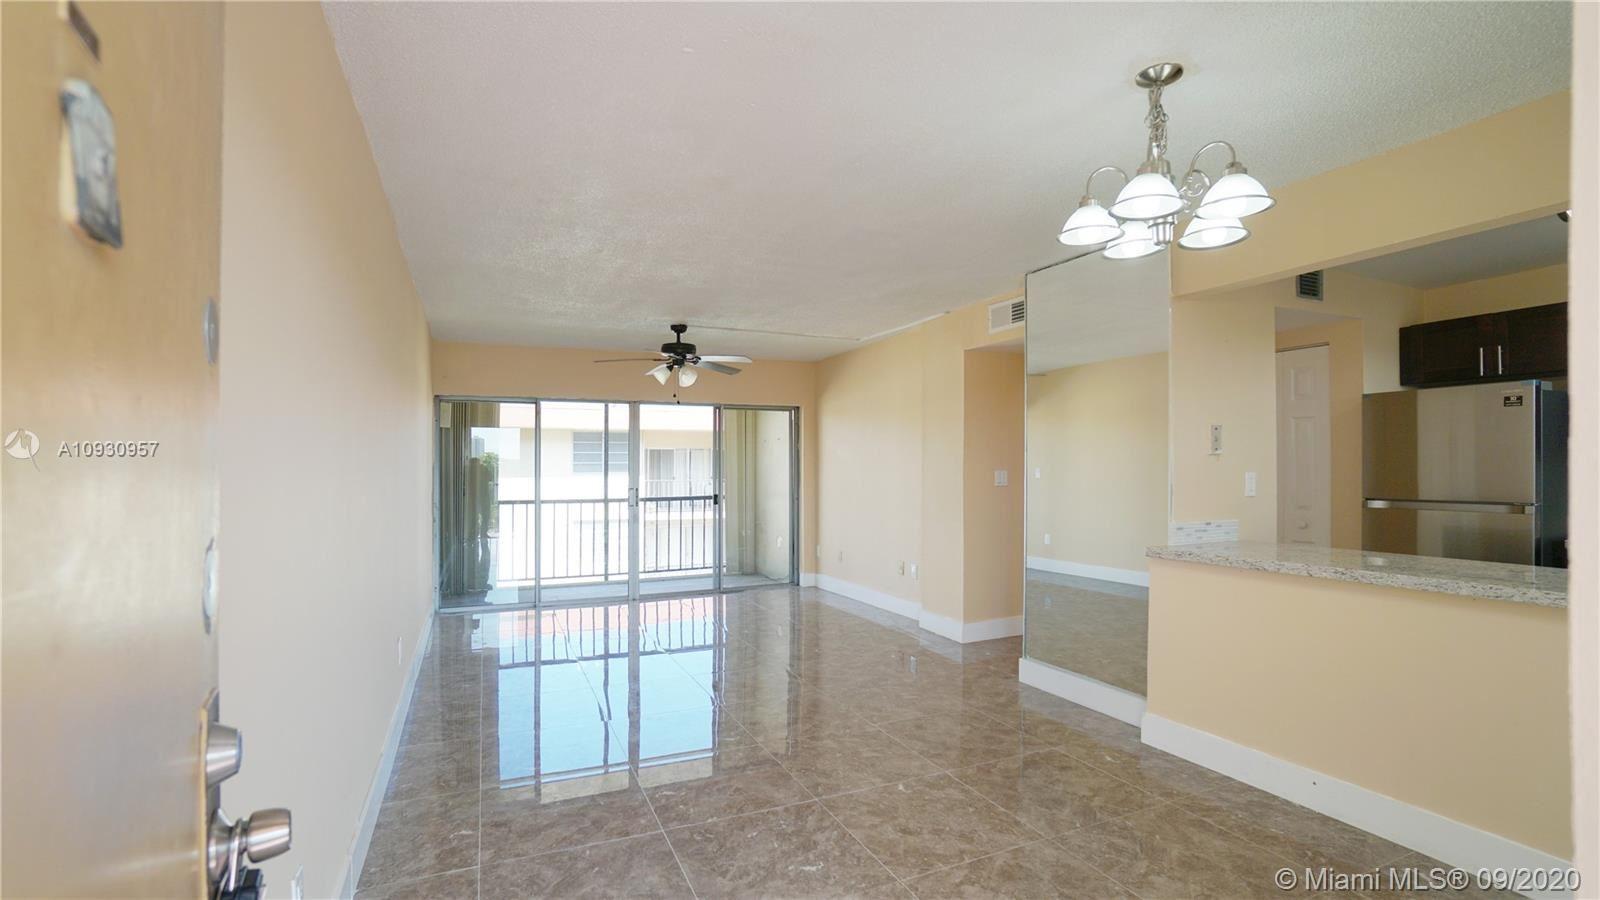 8889 Fontainebleau Blvd #406, Miami, FL 33172 - #: A10930957